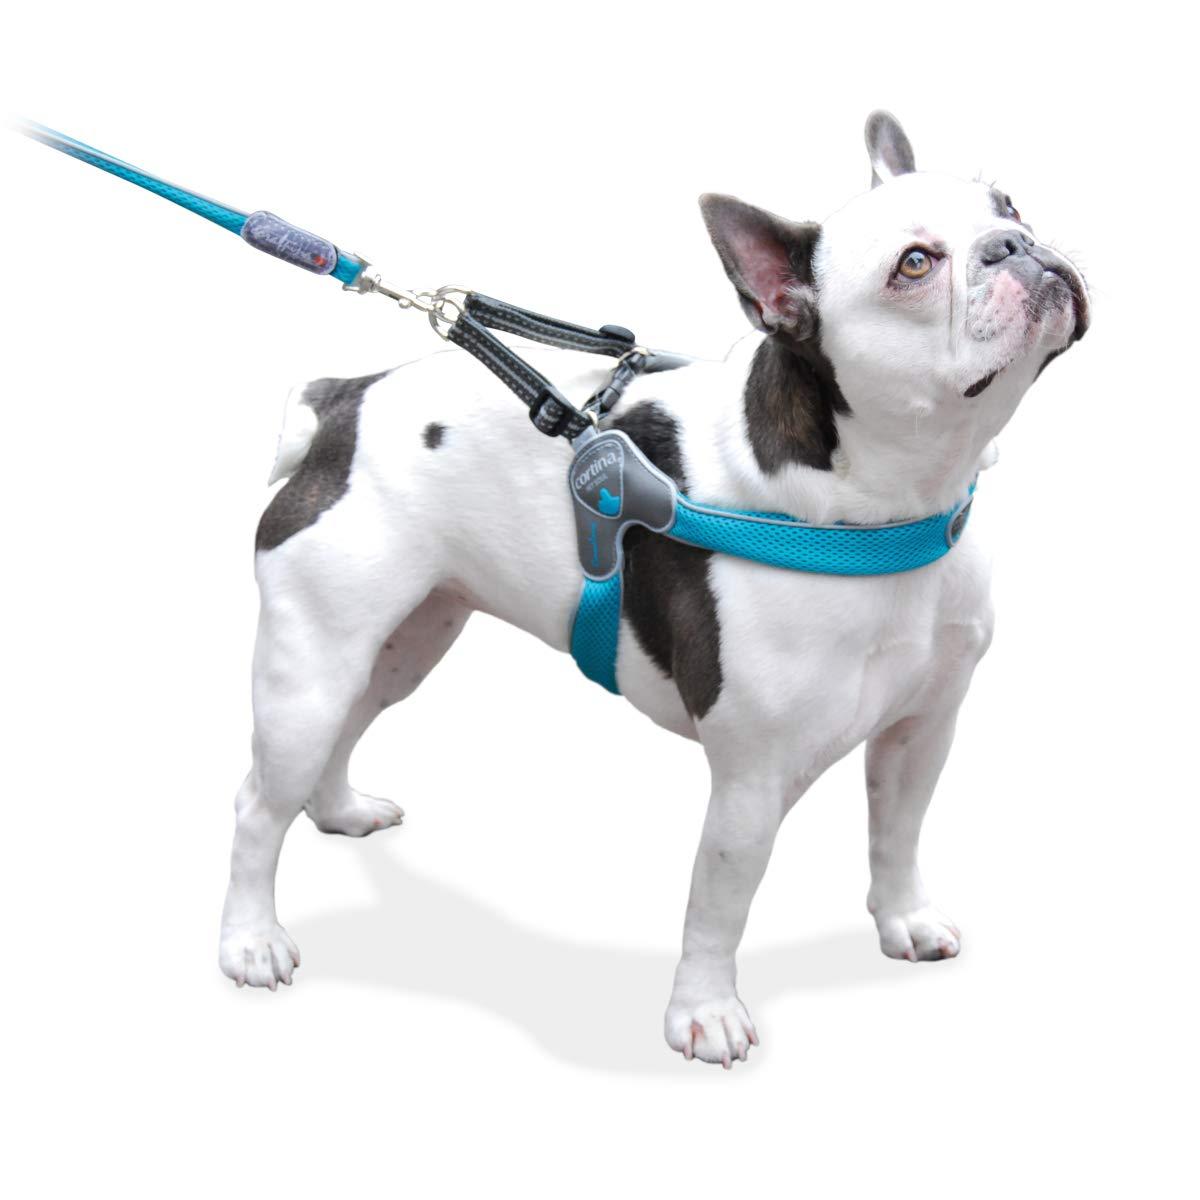 Coralpina Pettorina Dog /& Puppy Pettorina Design Italiano /& qualit/à Morbido Airmesh